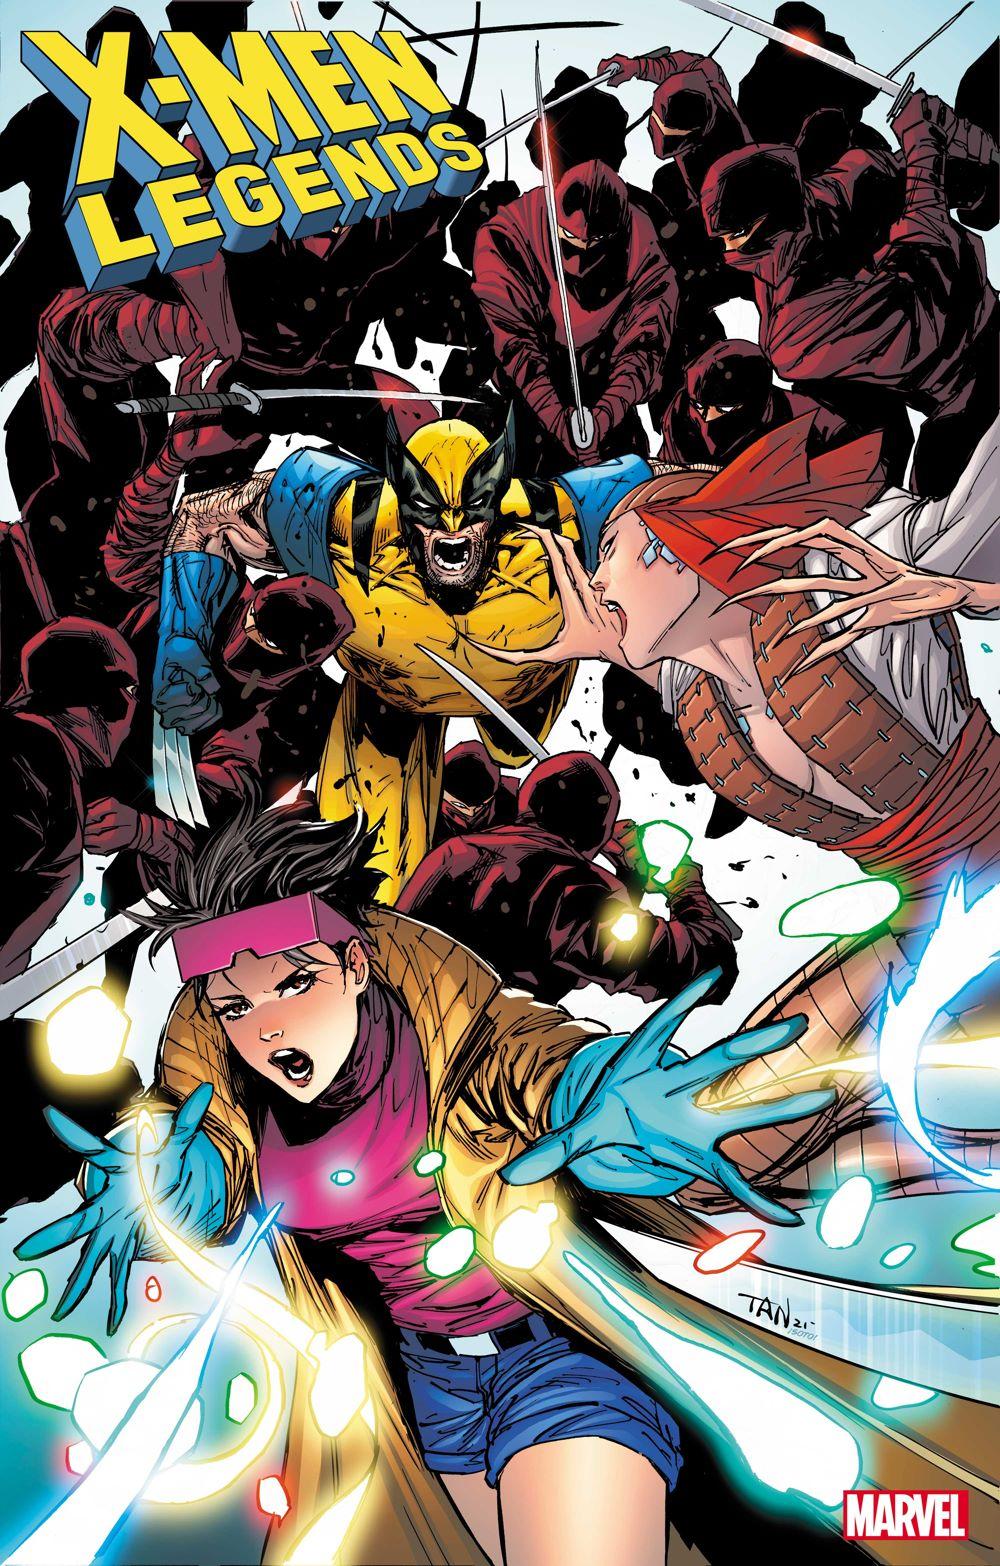 XMLEGENDS2021007_cover X-MEN LEGENDS #7 reunites Larry Hama and Wolverine